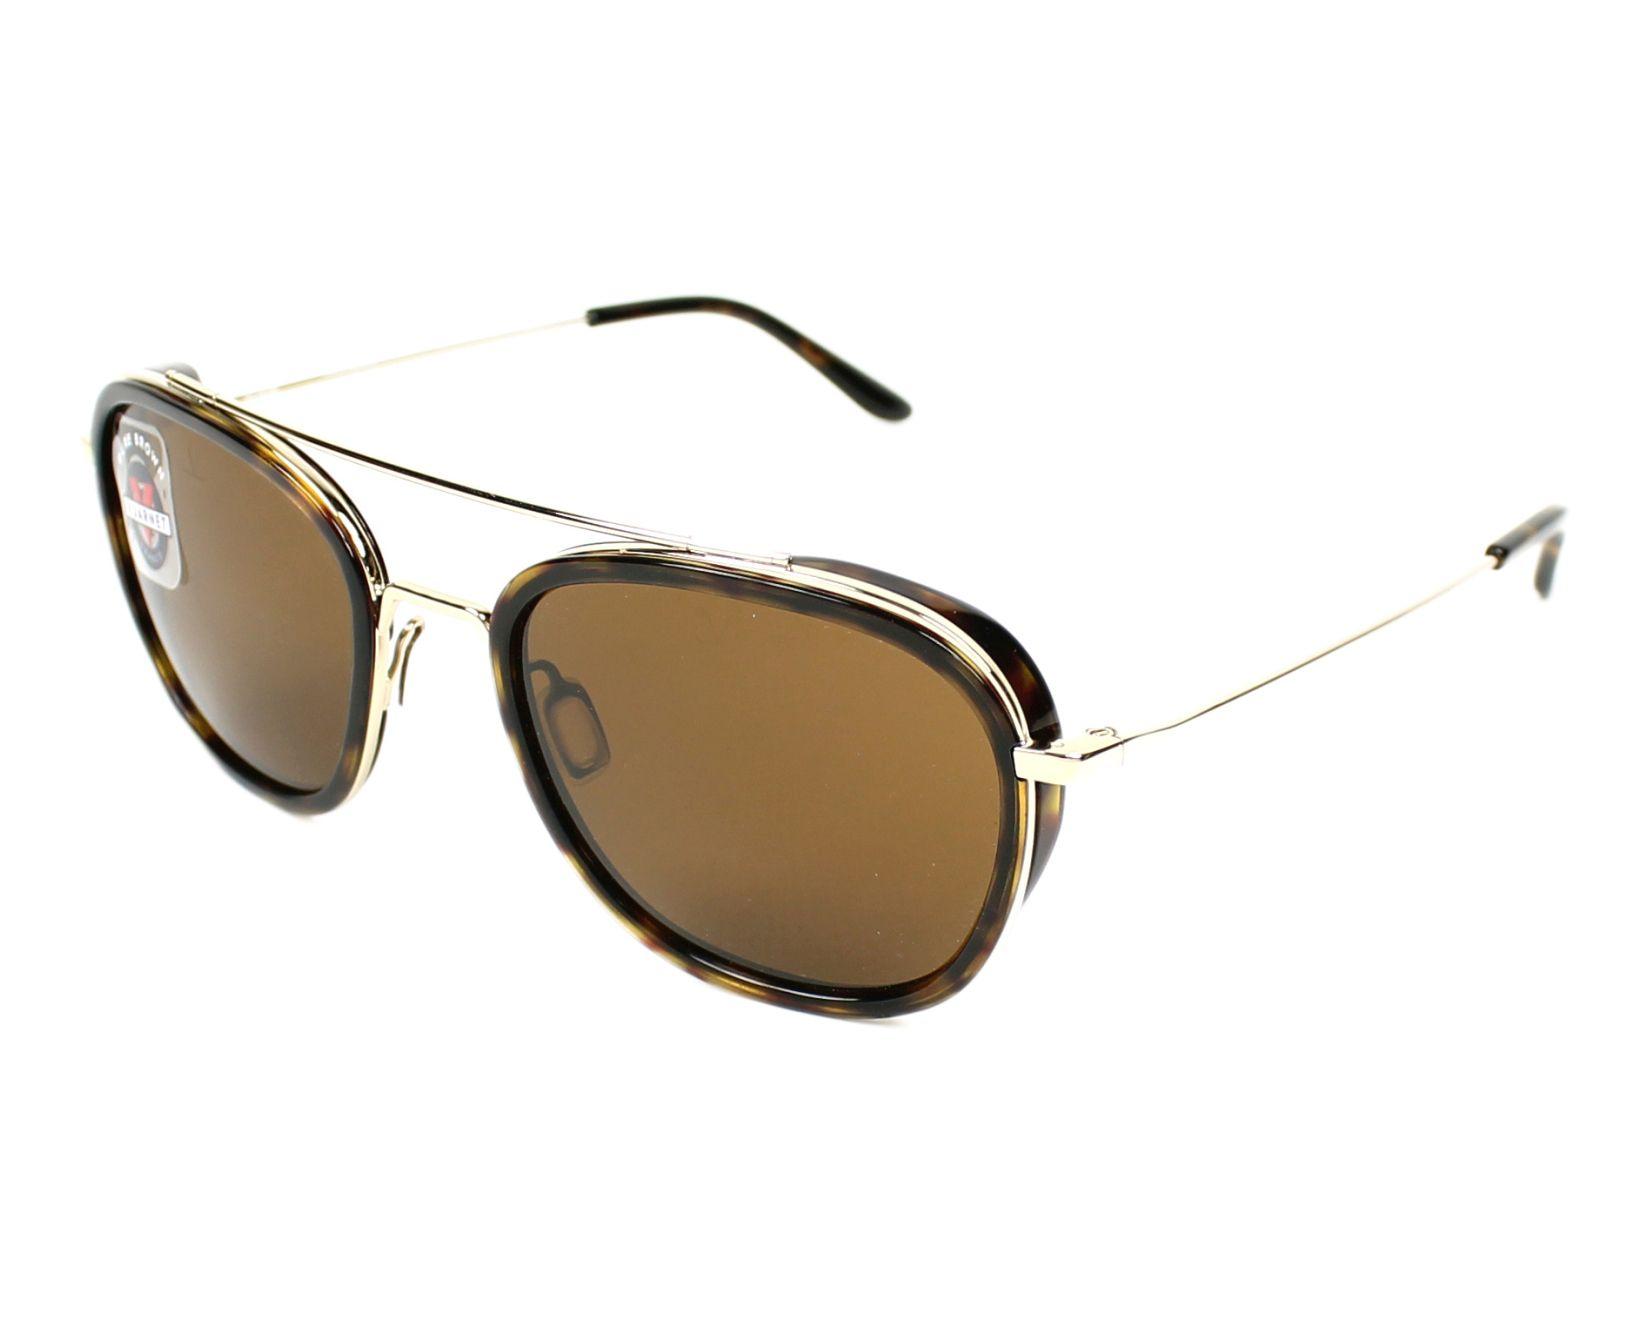 Sunglasses Vuarnet VL-1615 0002-2121 50-18 Gold Havana profile view 20218f6ac858